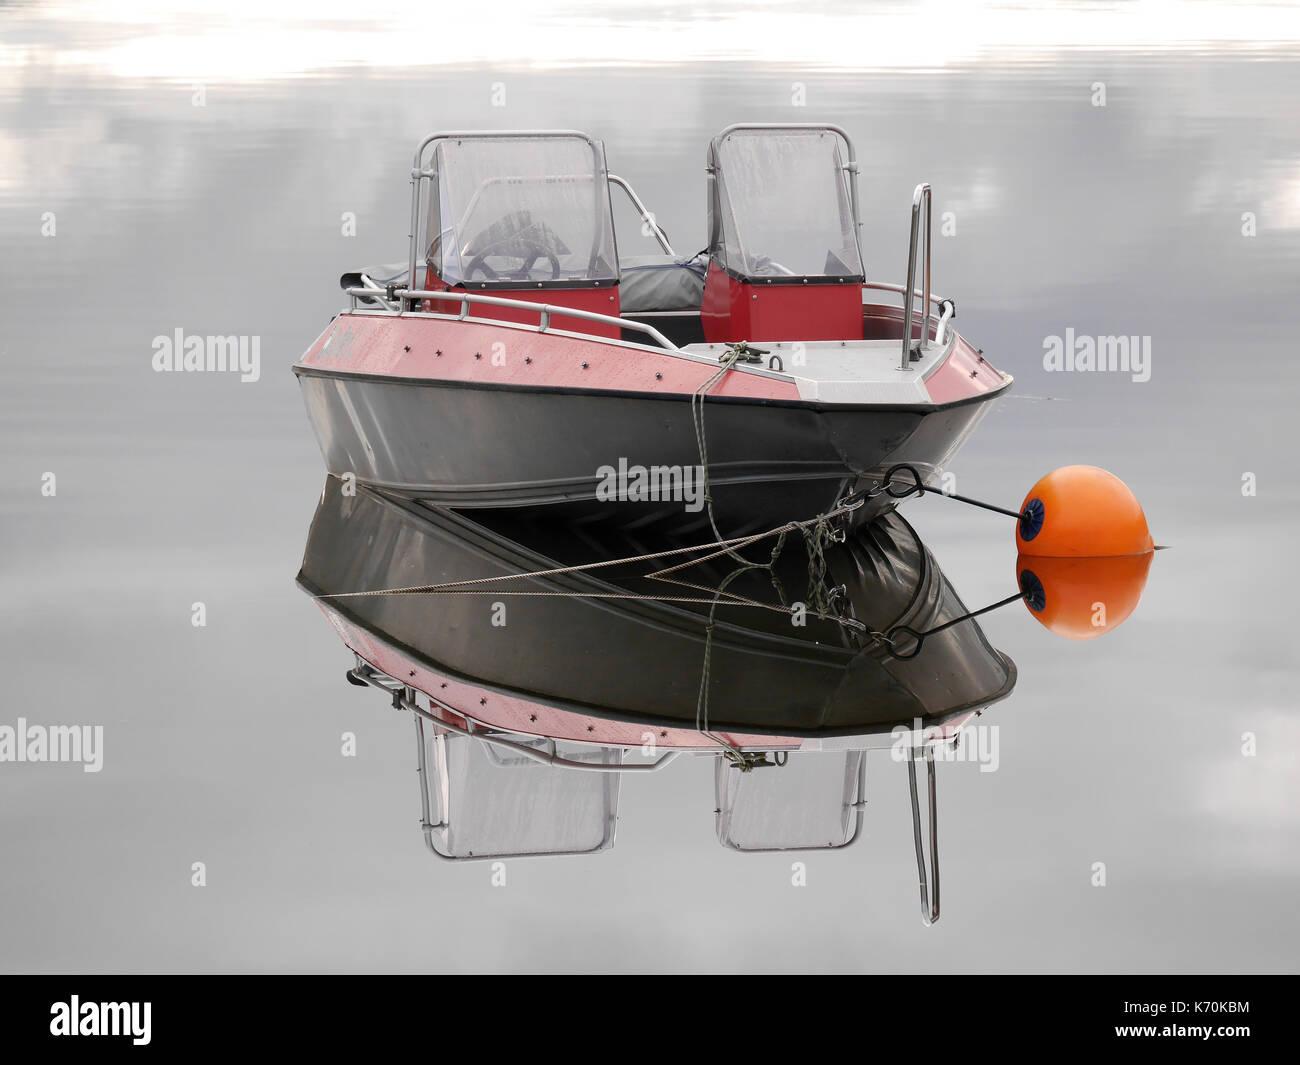 Buster aluminium boat reflects in the calm lake Åresjön, Åre, Jämtland, Sweden.Orange buoy secures the boat. - Stock Image